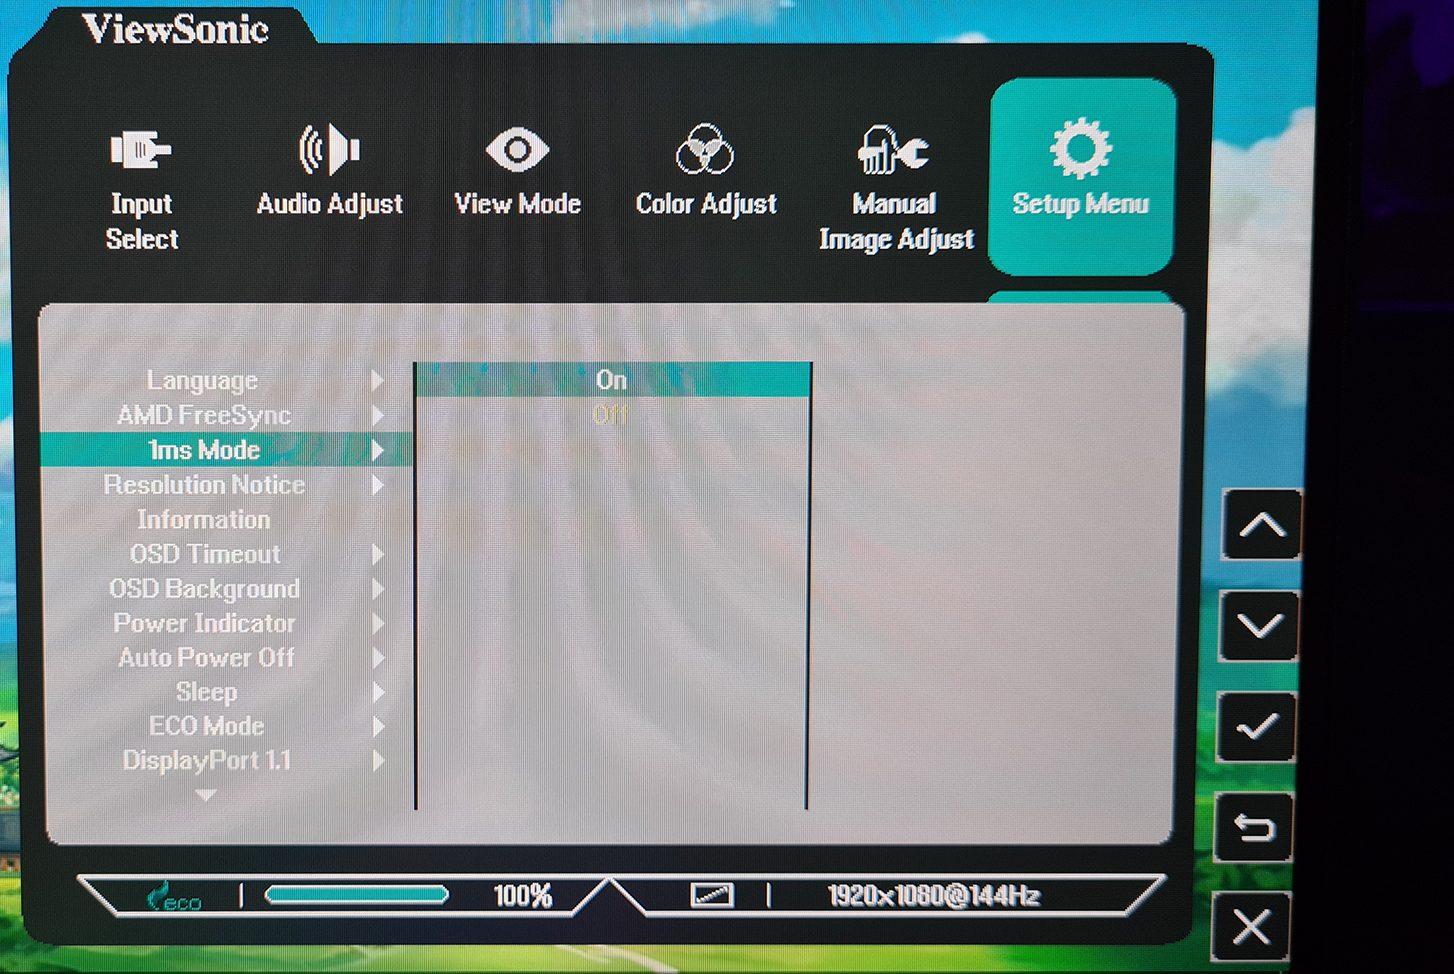 Viewsonic XG2405 - Menü Interface